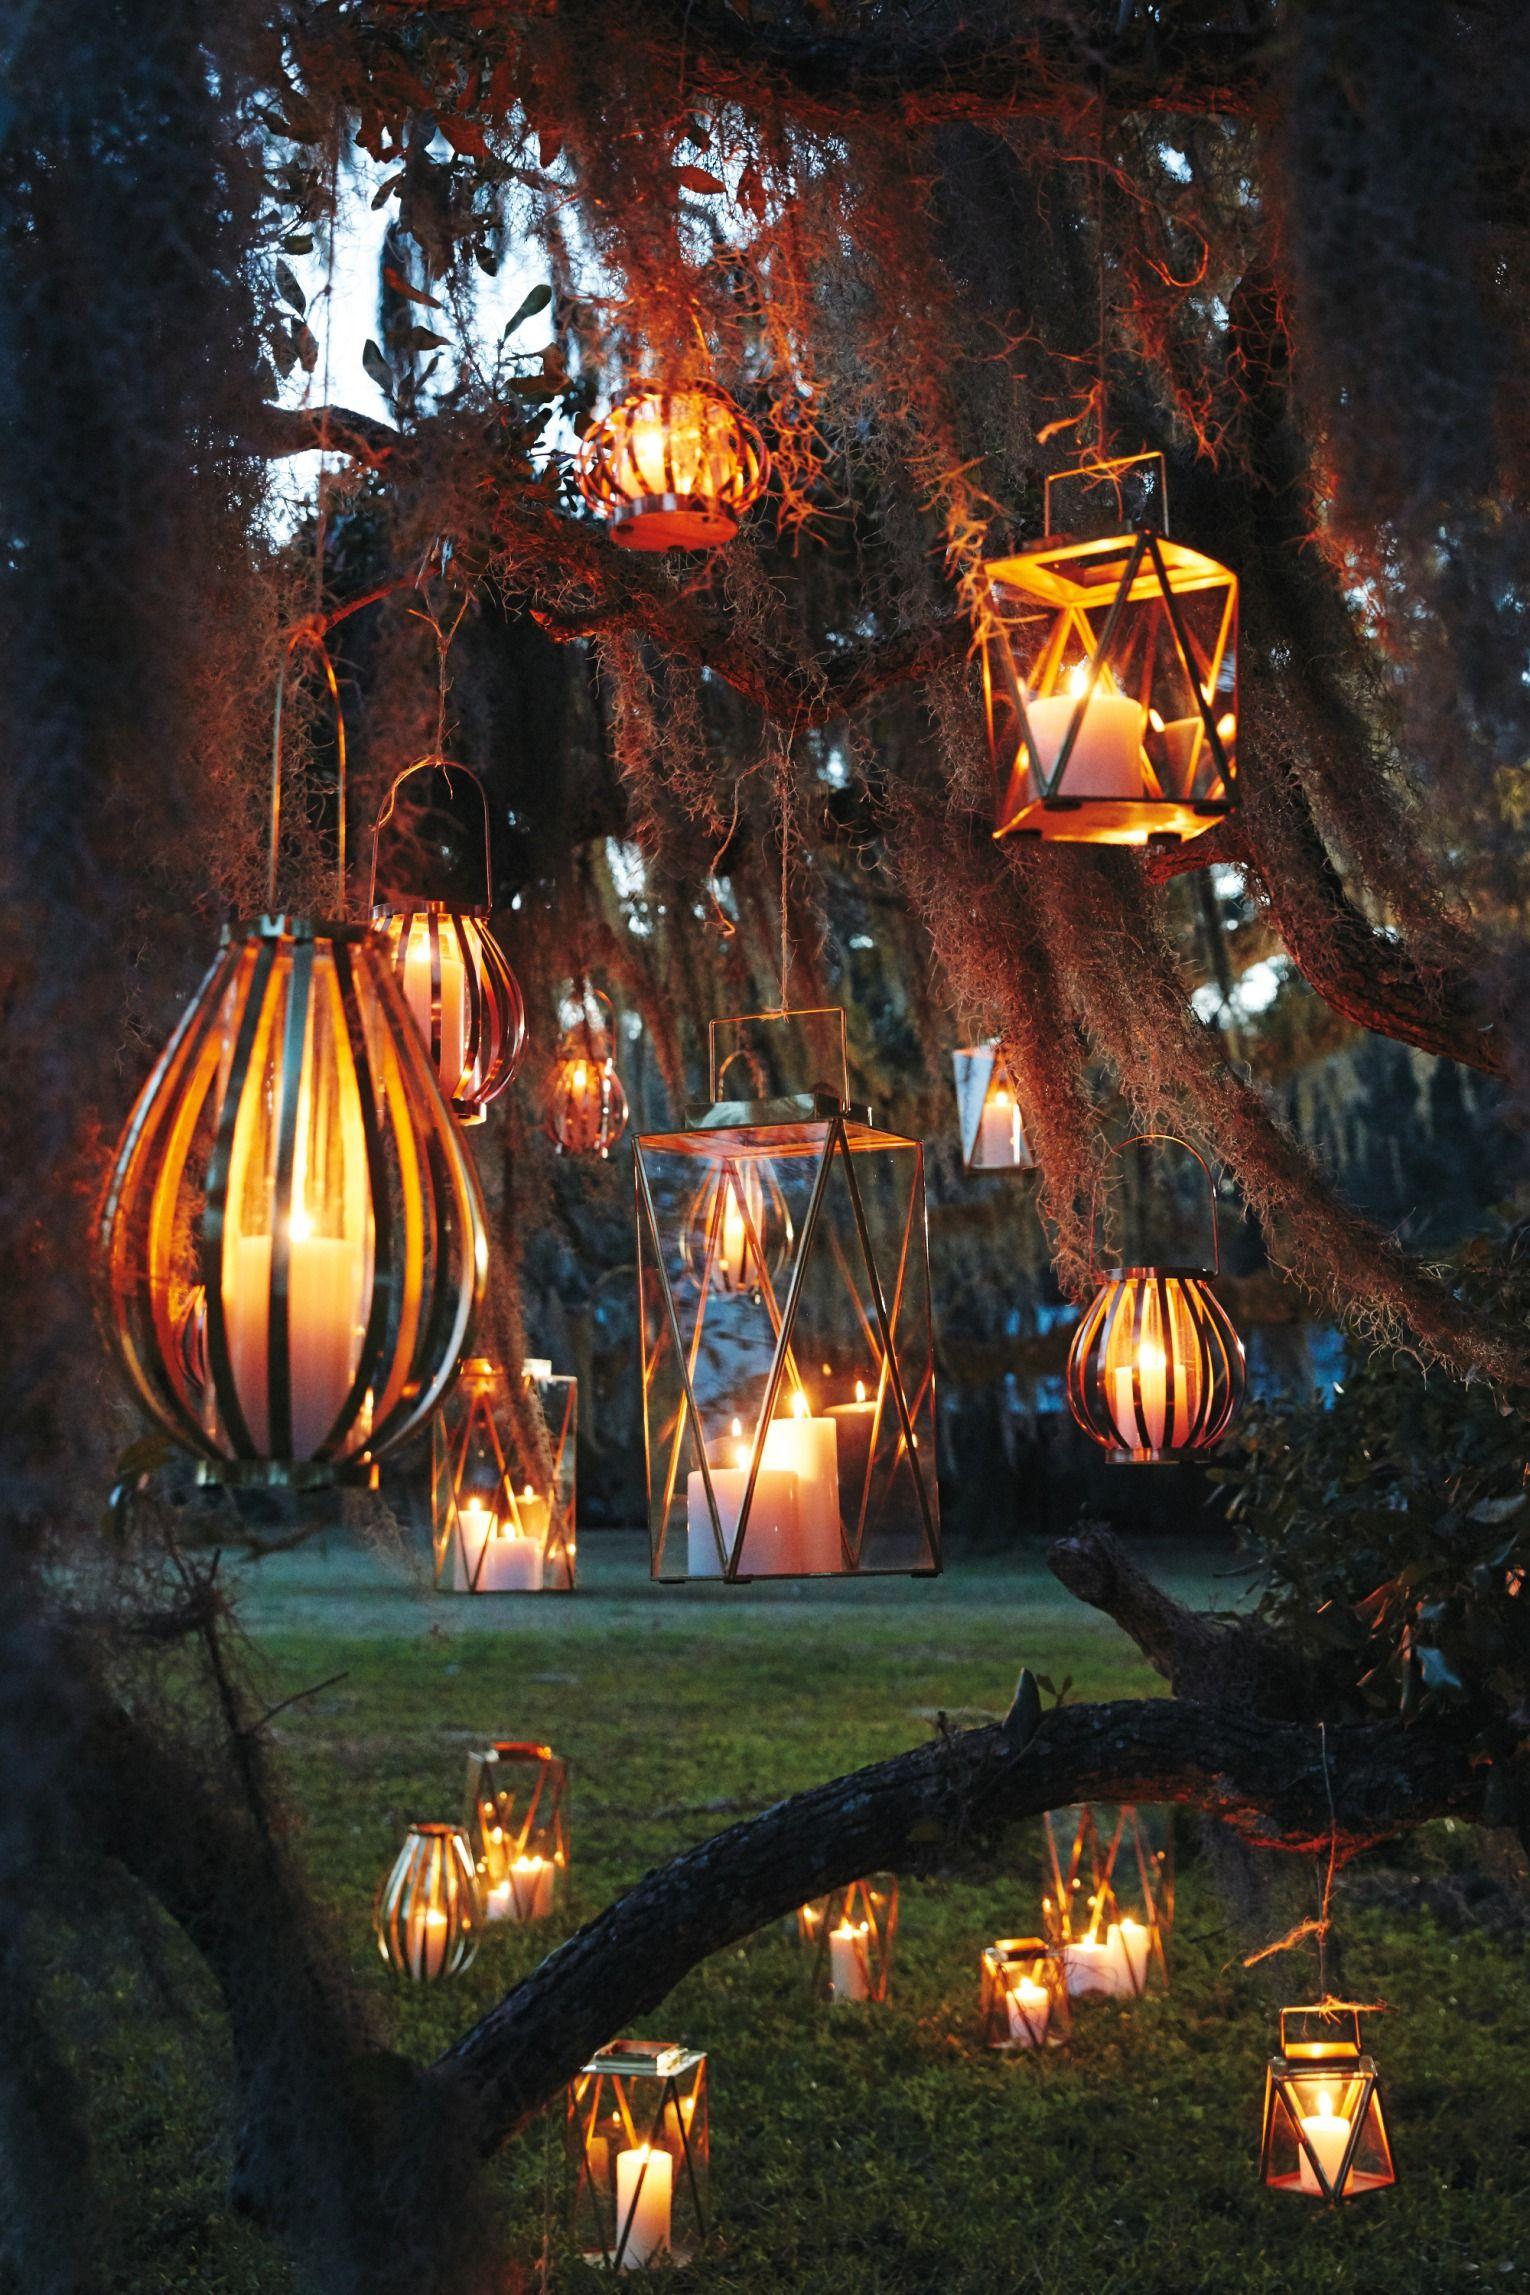 Nantucket brass lantern brass lantern lights and gardens nantucket brass lantern workwithnaturefo